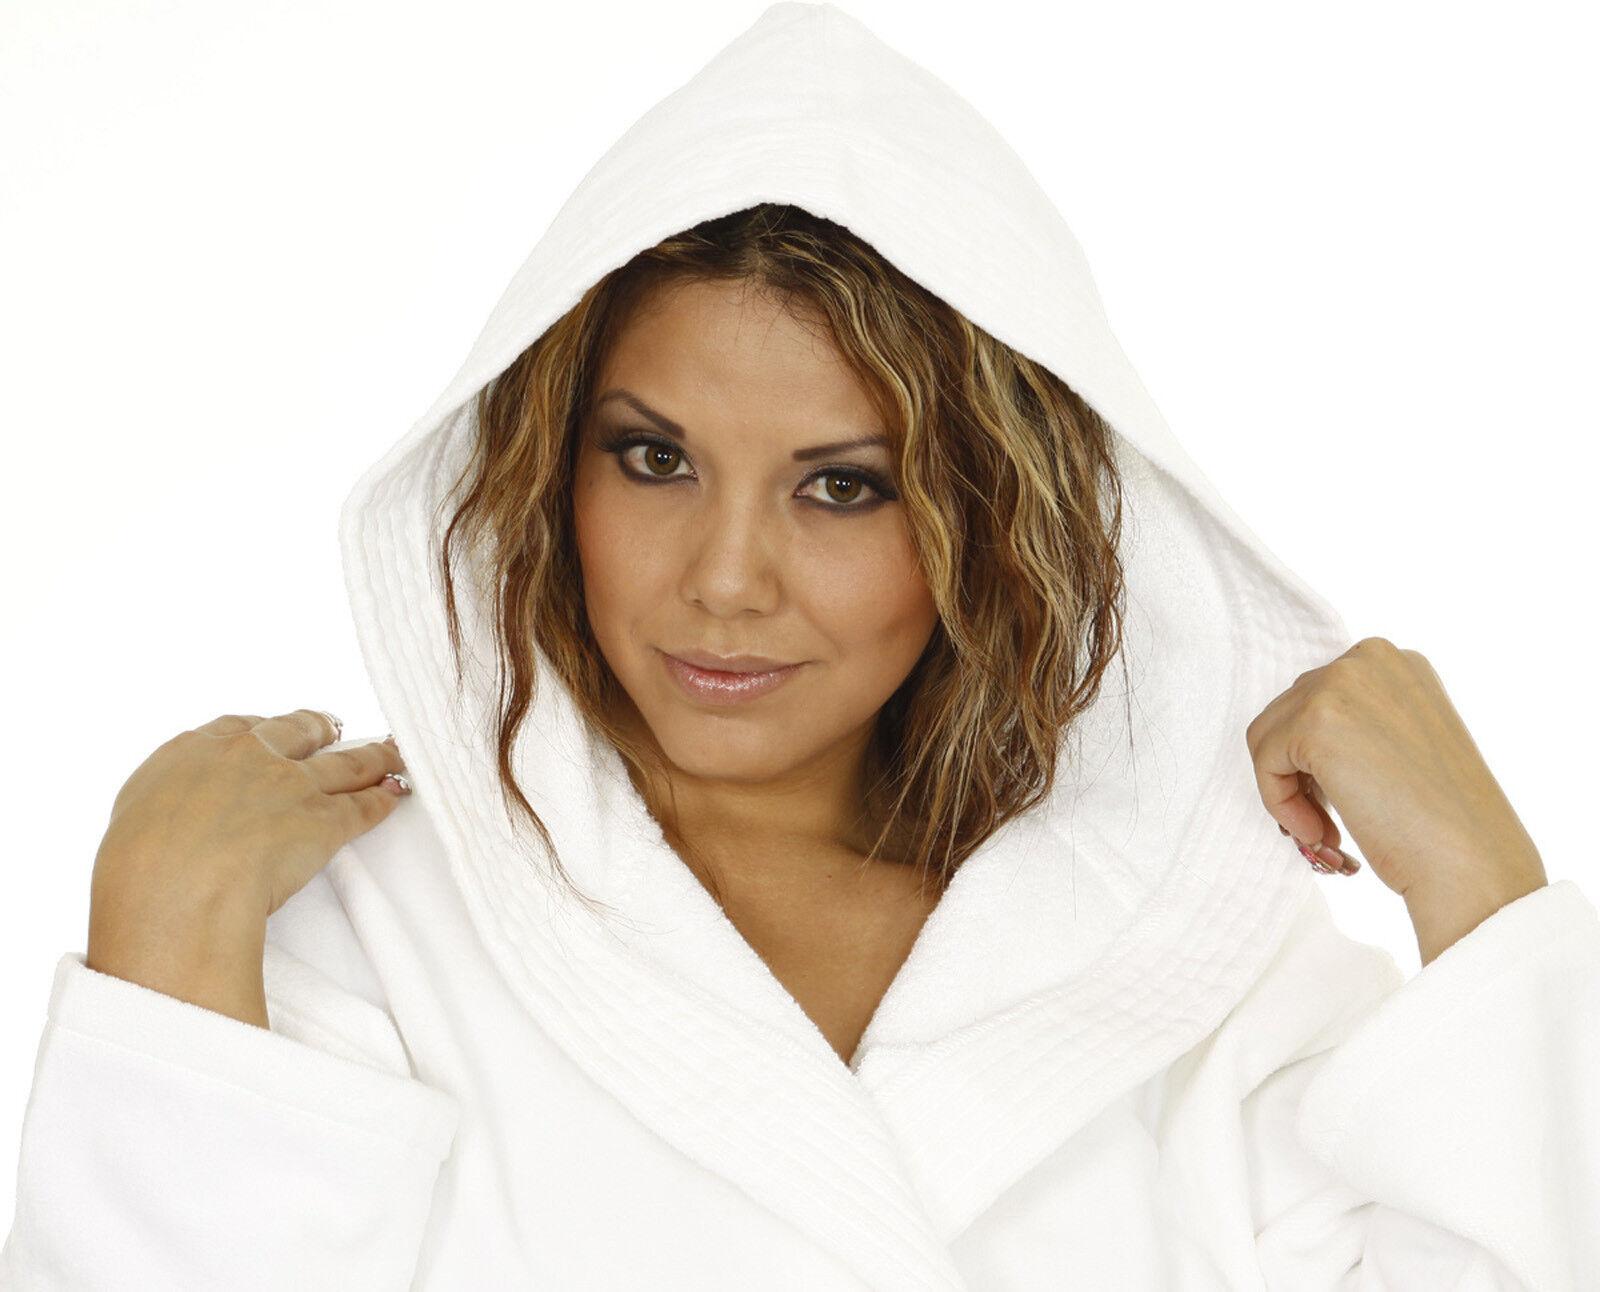 Missoni Bathrobe With Hood For Men Women Tiago Terry For Sale Online Ebay